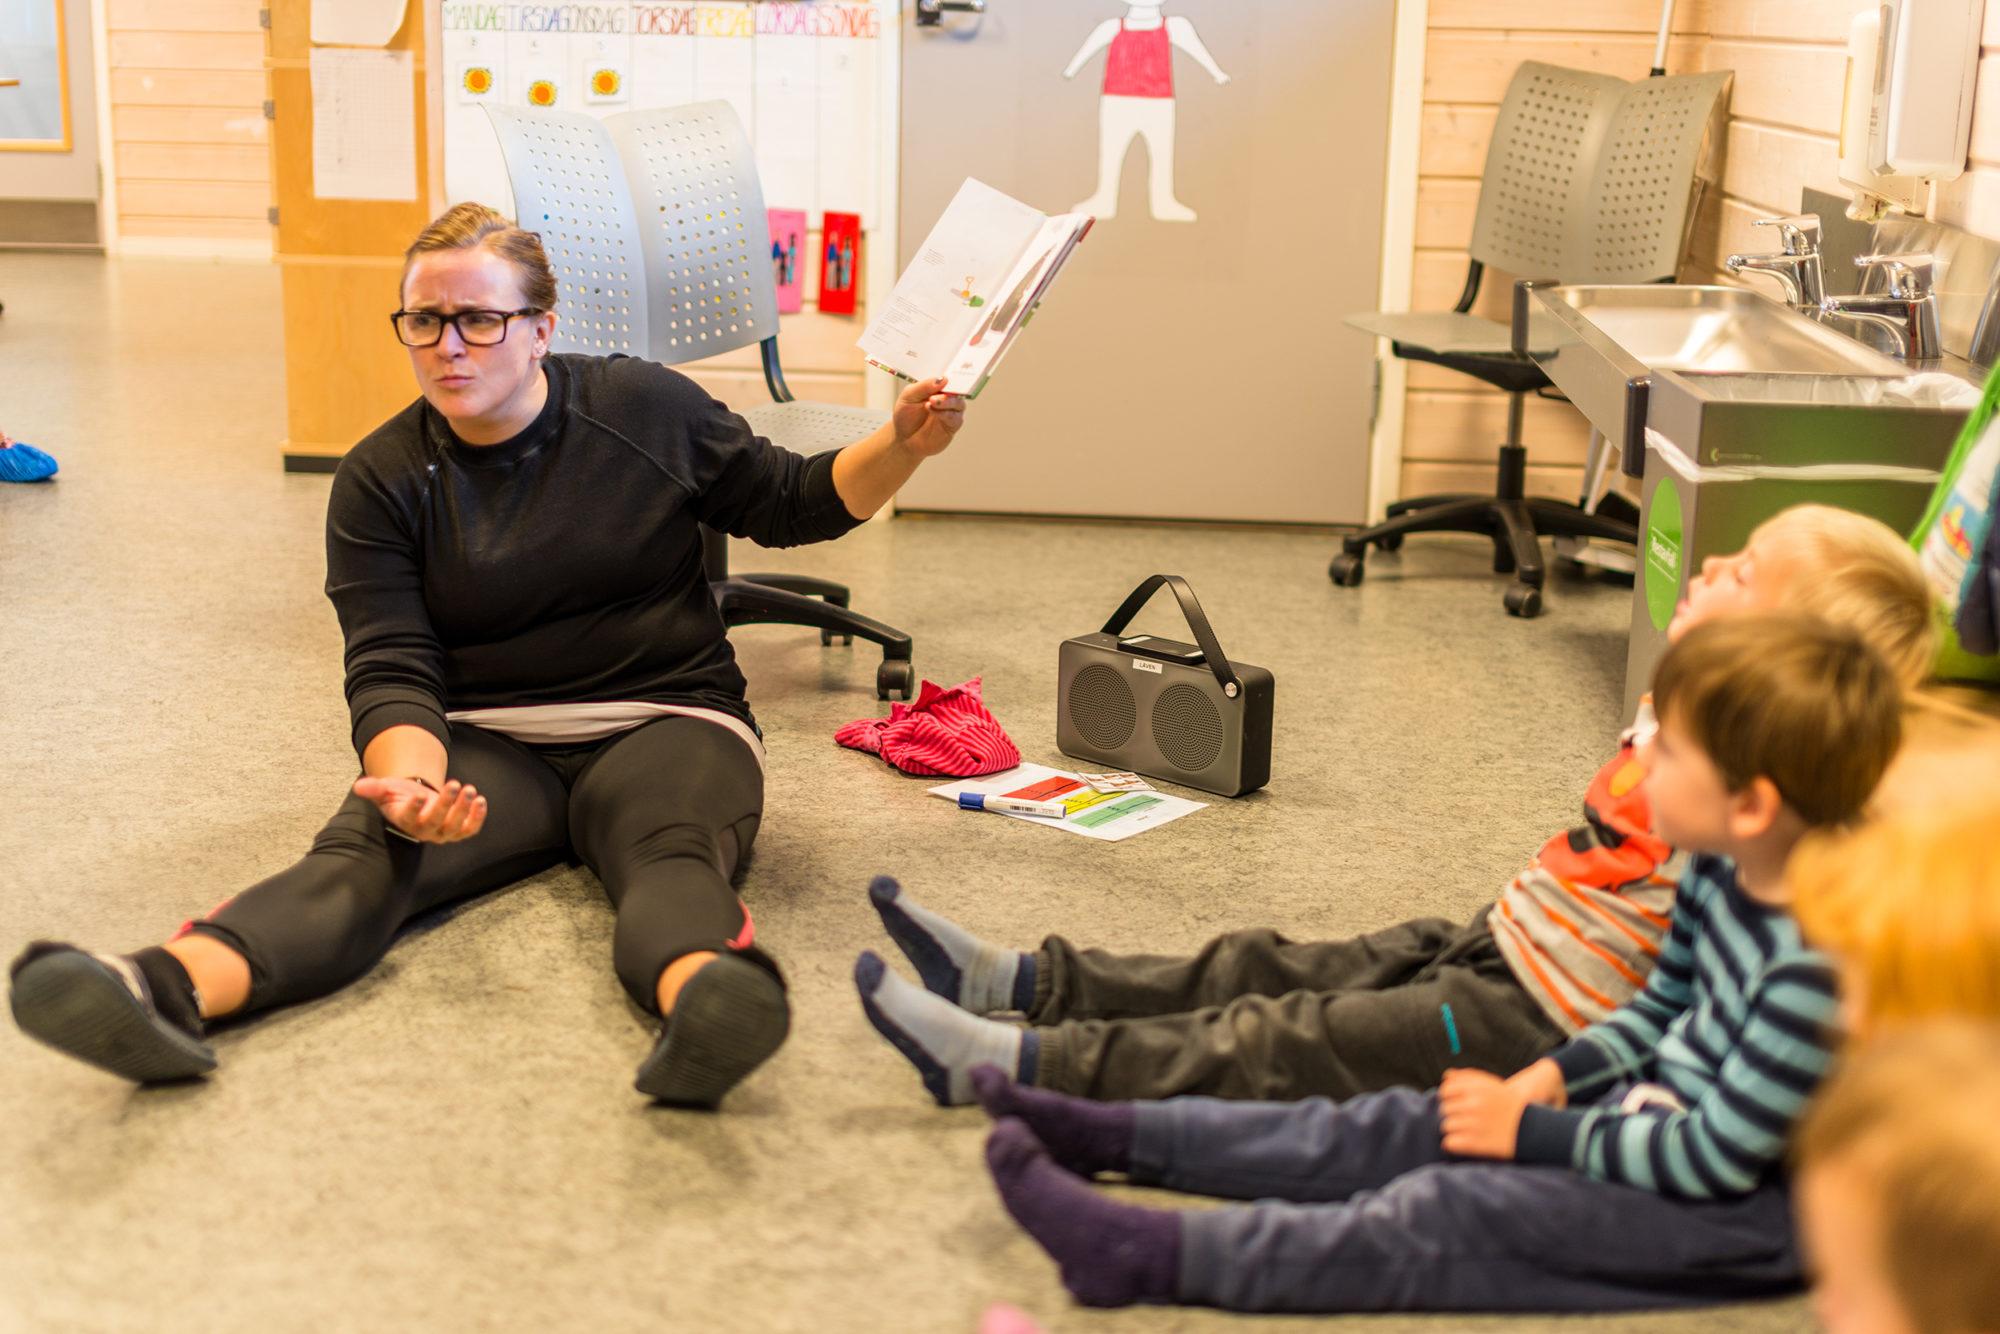 Voksen i barnehage har lesestund med barna